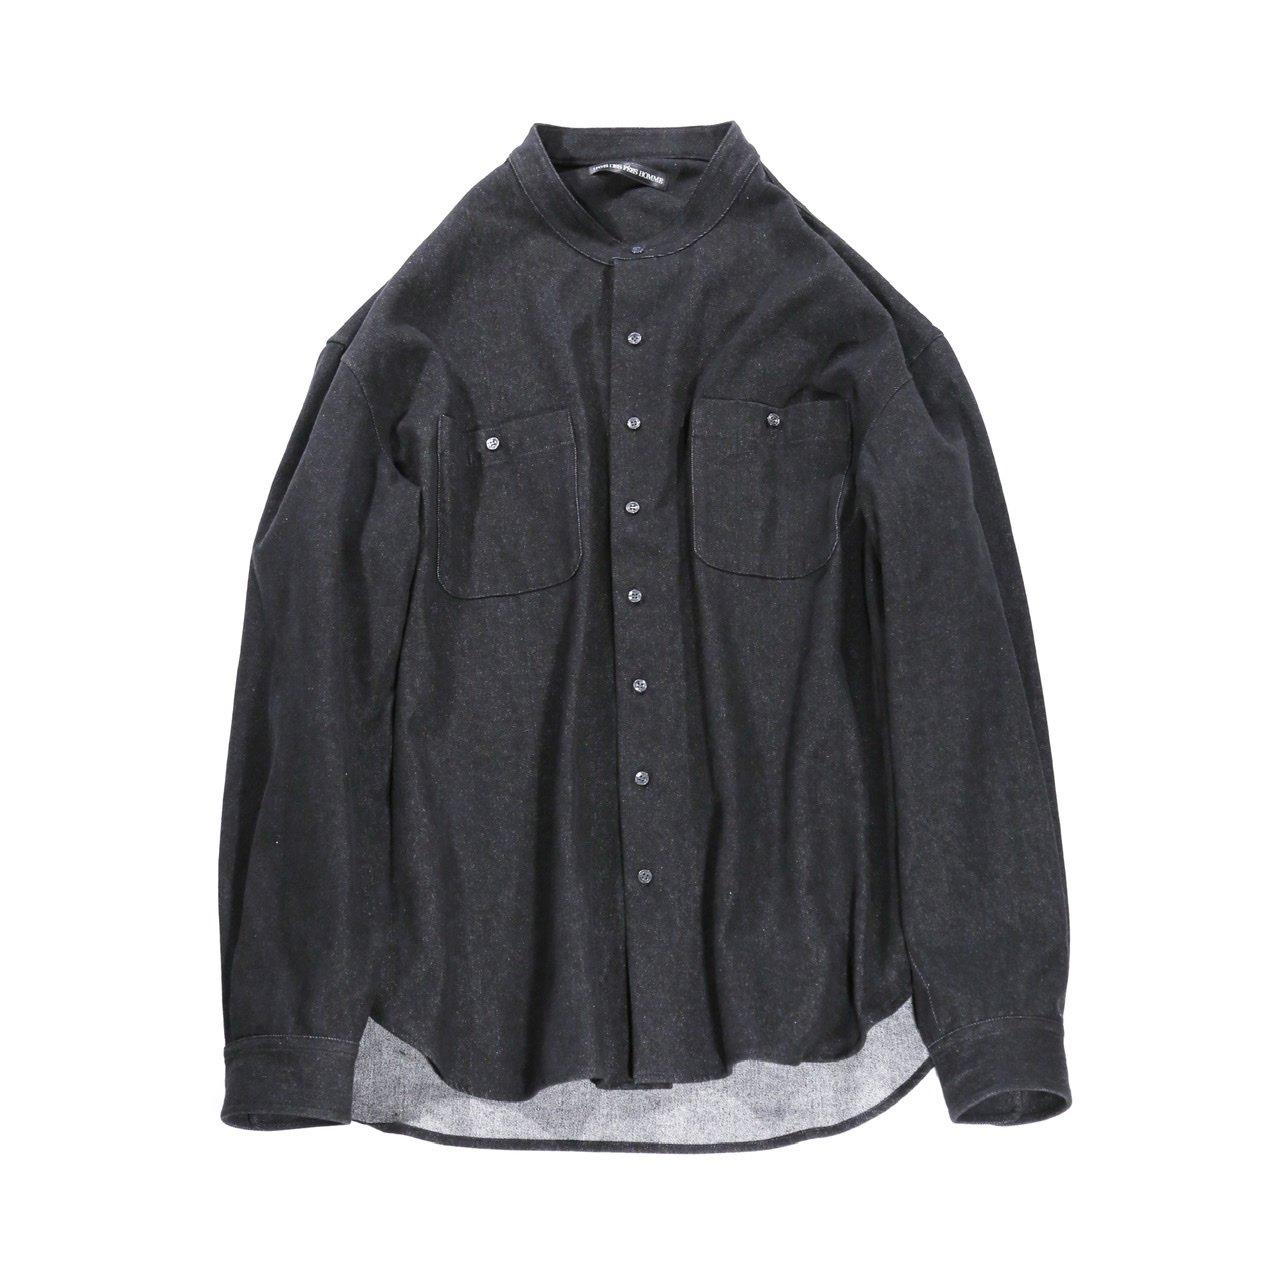 Oversized no collar black denim shirt jacket (受注商品)